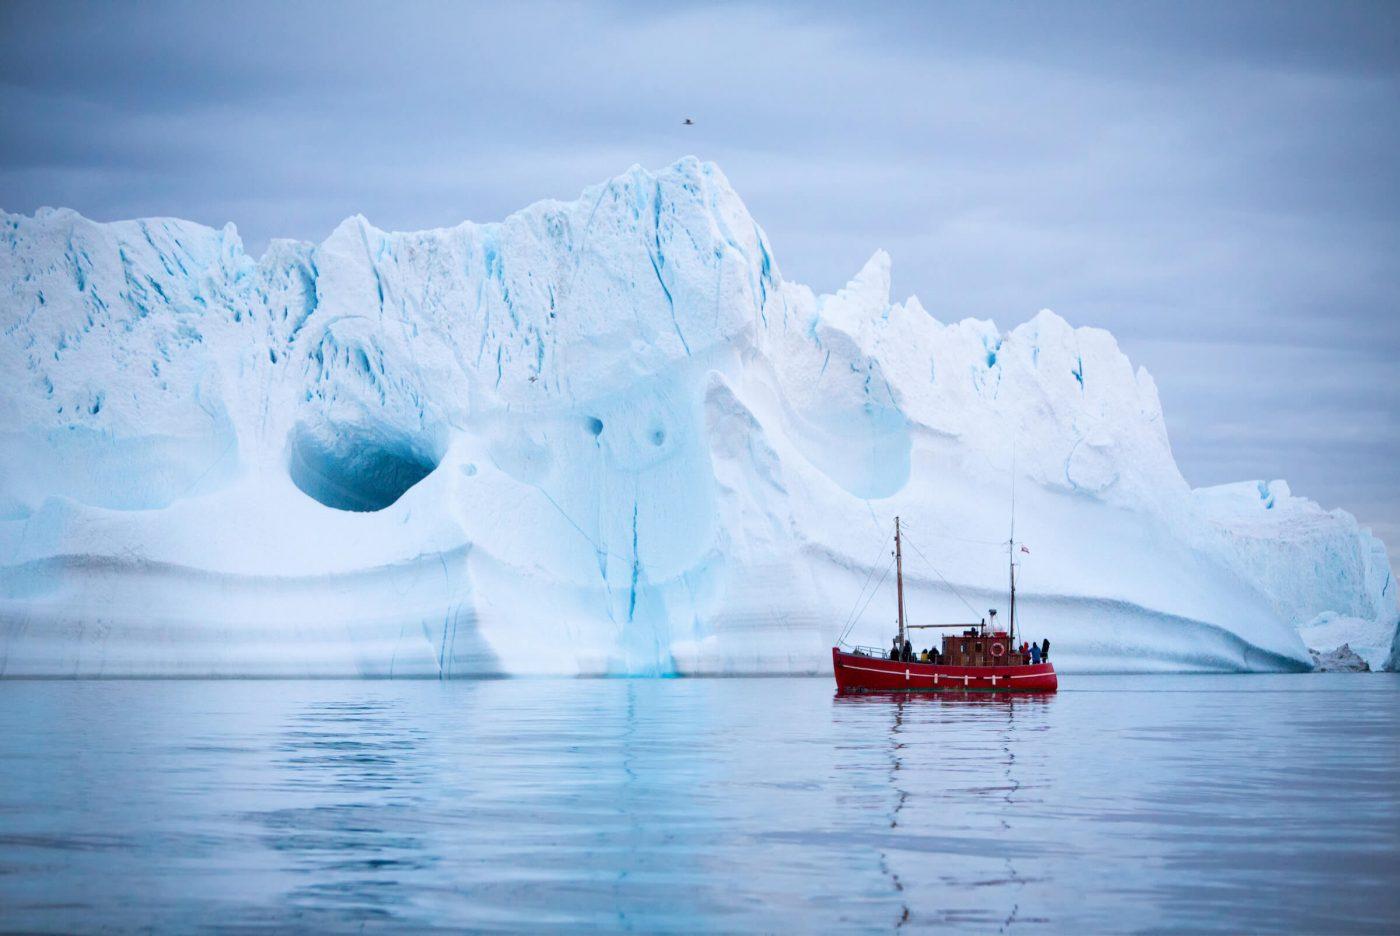 Trump com interesse em adquirir a Gronelândia